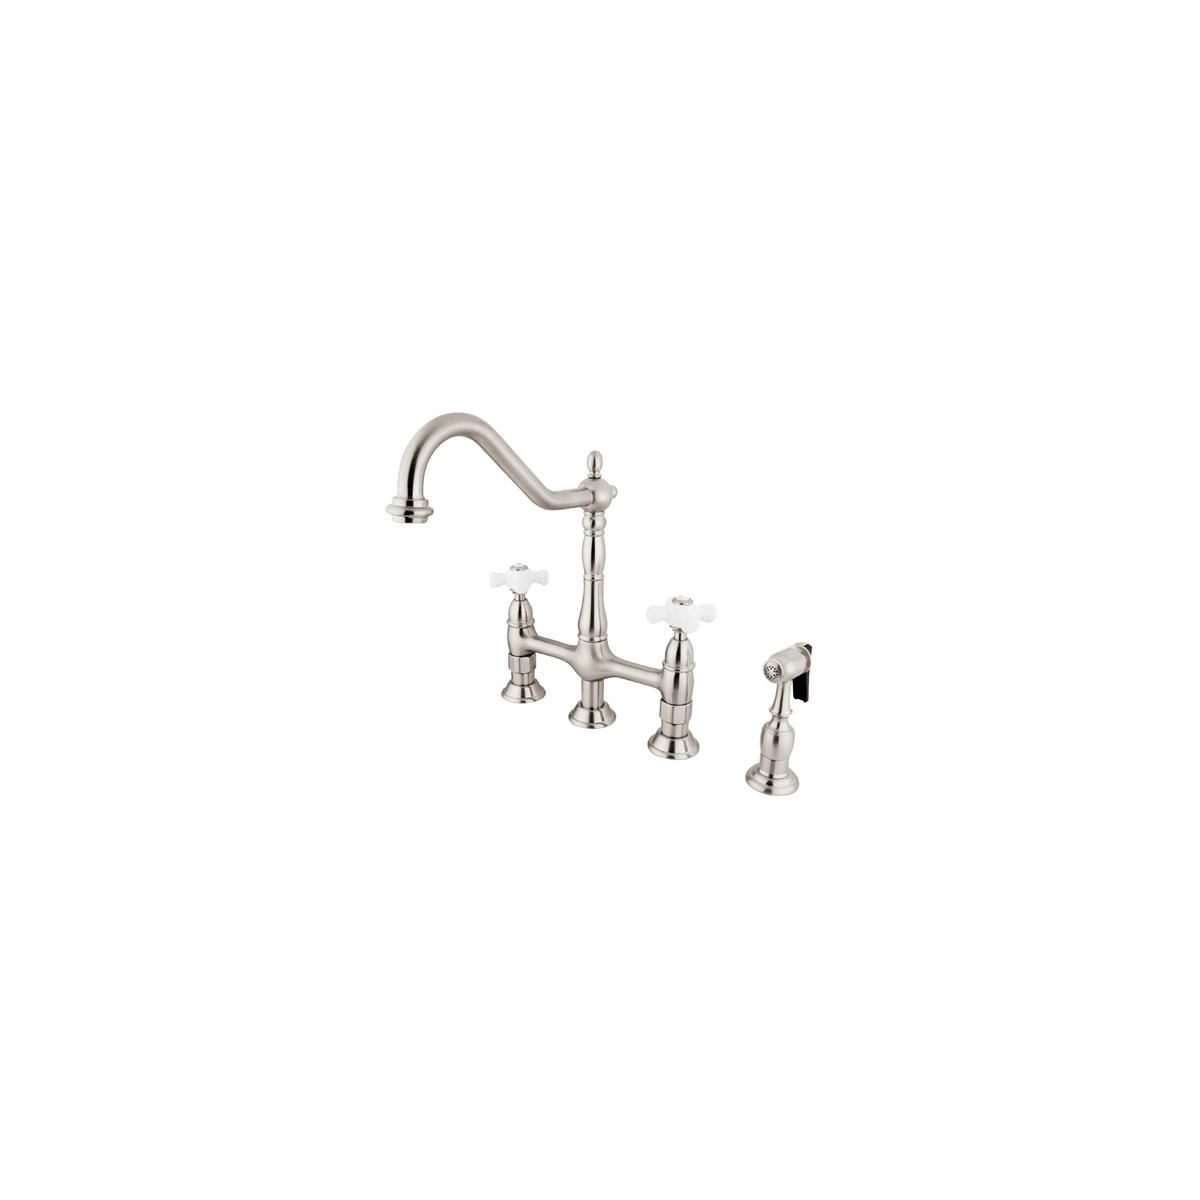 Kingston Br Ks1273pxbs Vintage Heritage 1 8 Gpm Double Handle Bridge Style Kitchen Faucet Includes Side Spray